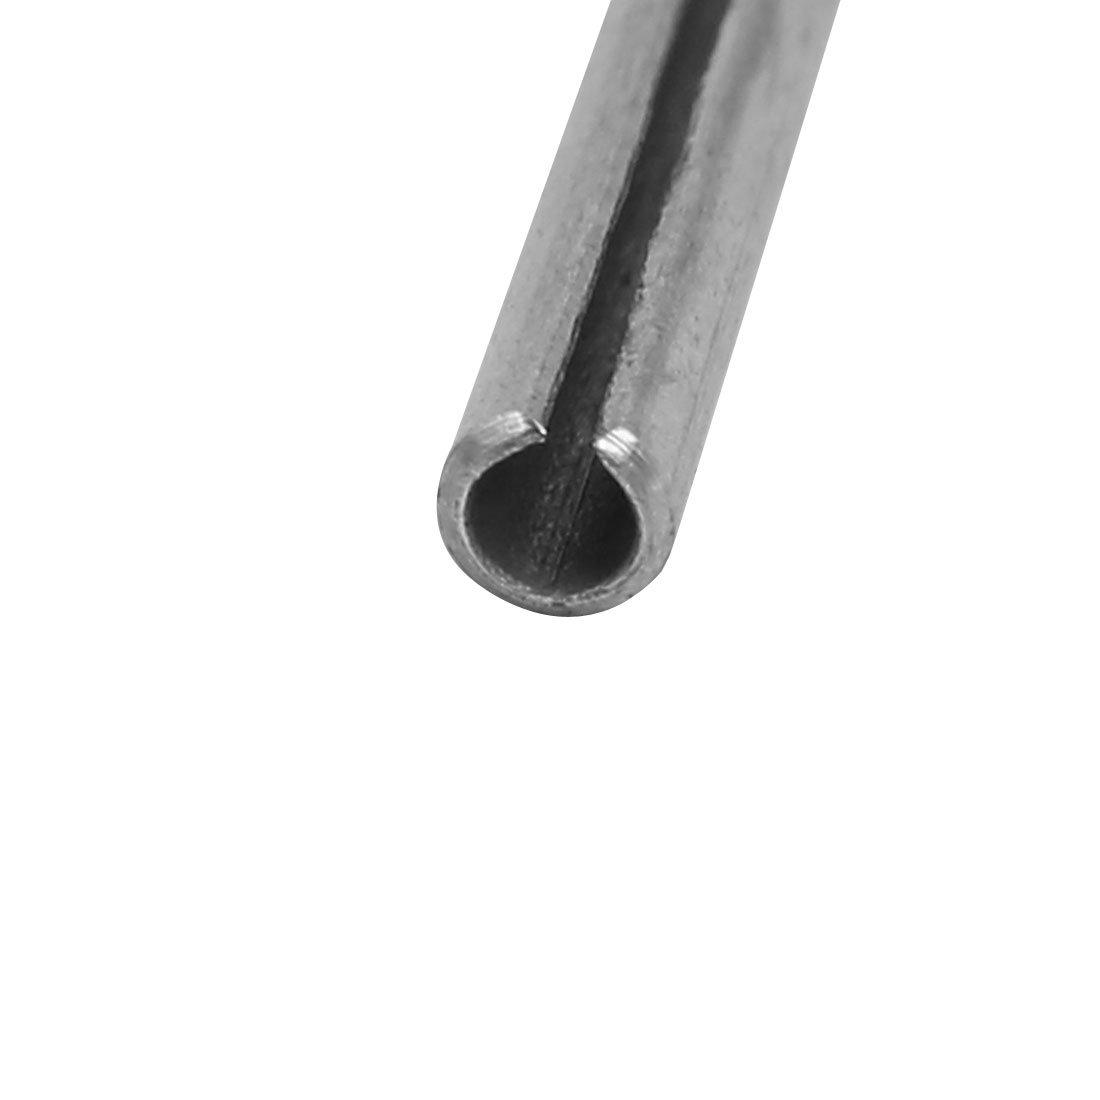 5//16-18 x 4 Piece-4 Hard-to-Find Fastener 014973182717 Full Thread Bolts